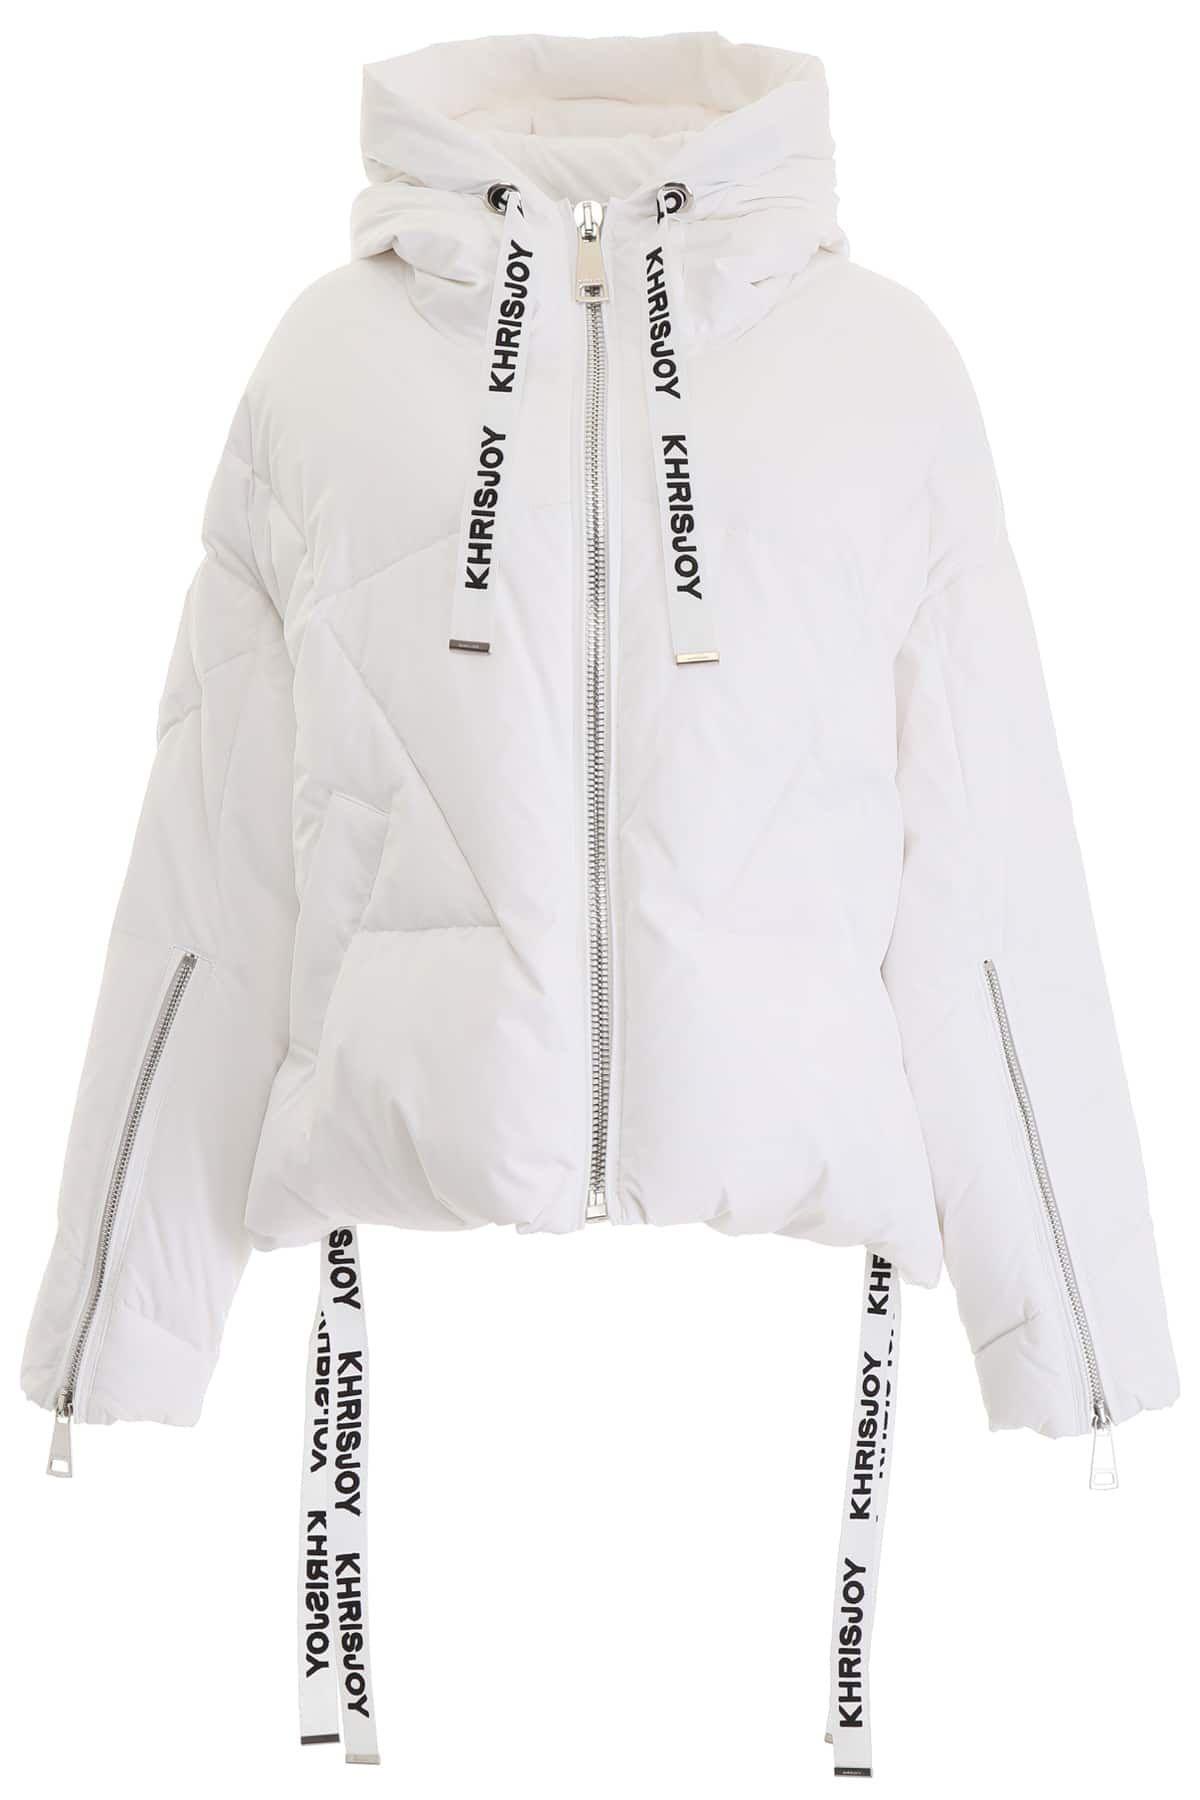 Khrisjoy Khris Puffer Jacket Khrisjoy Cloth Puffer Jacket Outfit Jackets Black Girl Fashion [ 1800 x 1200 Pixel ]